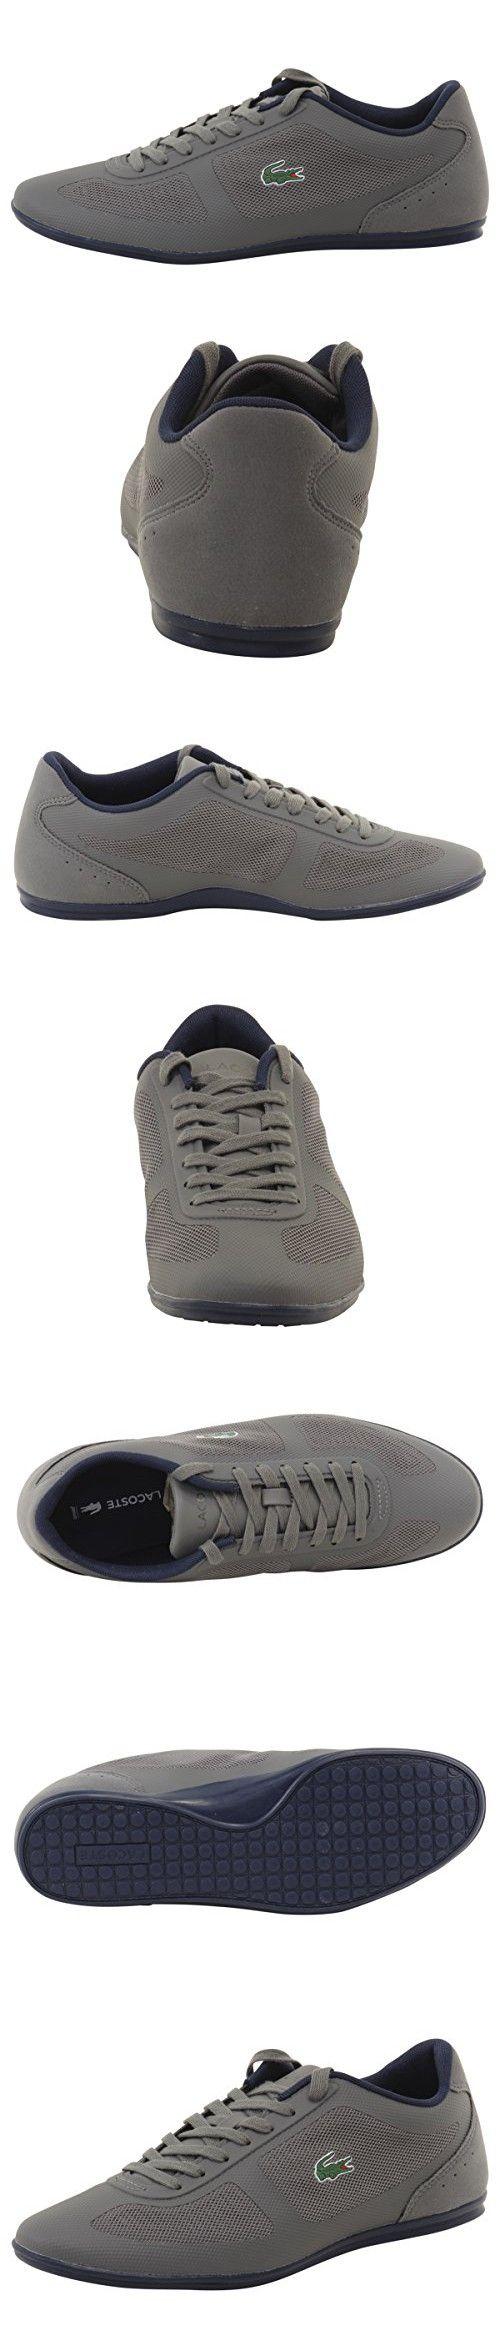 Lacoste Men's Misano Evo 316 1 Spm Fashion Sneaker, Grey, 9 M US